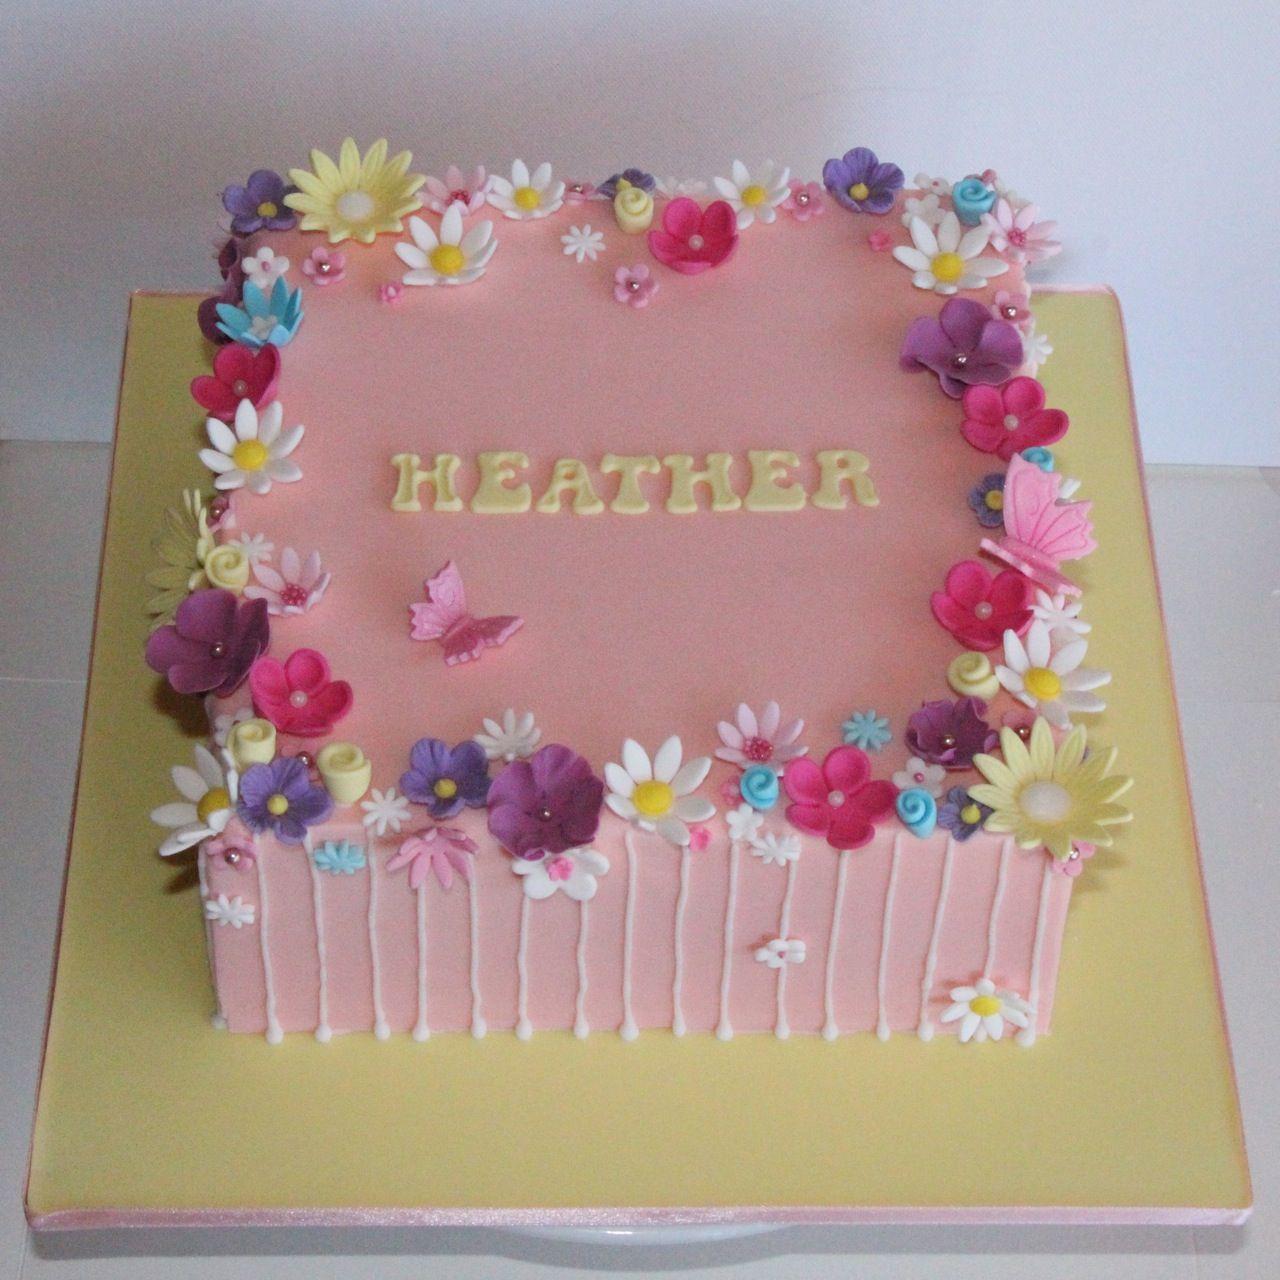 Floral cake designs flower garden cake cakes pinterest cake floral cake designs flower garden cake izmirmasajfo